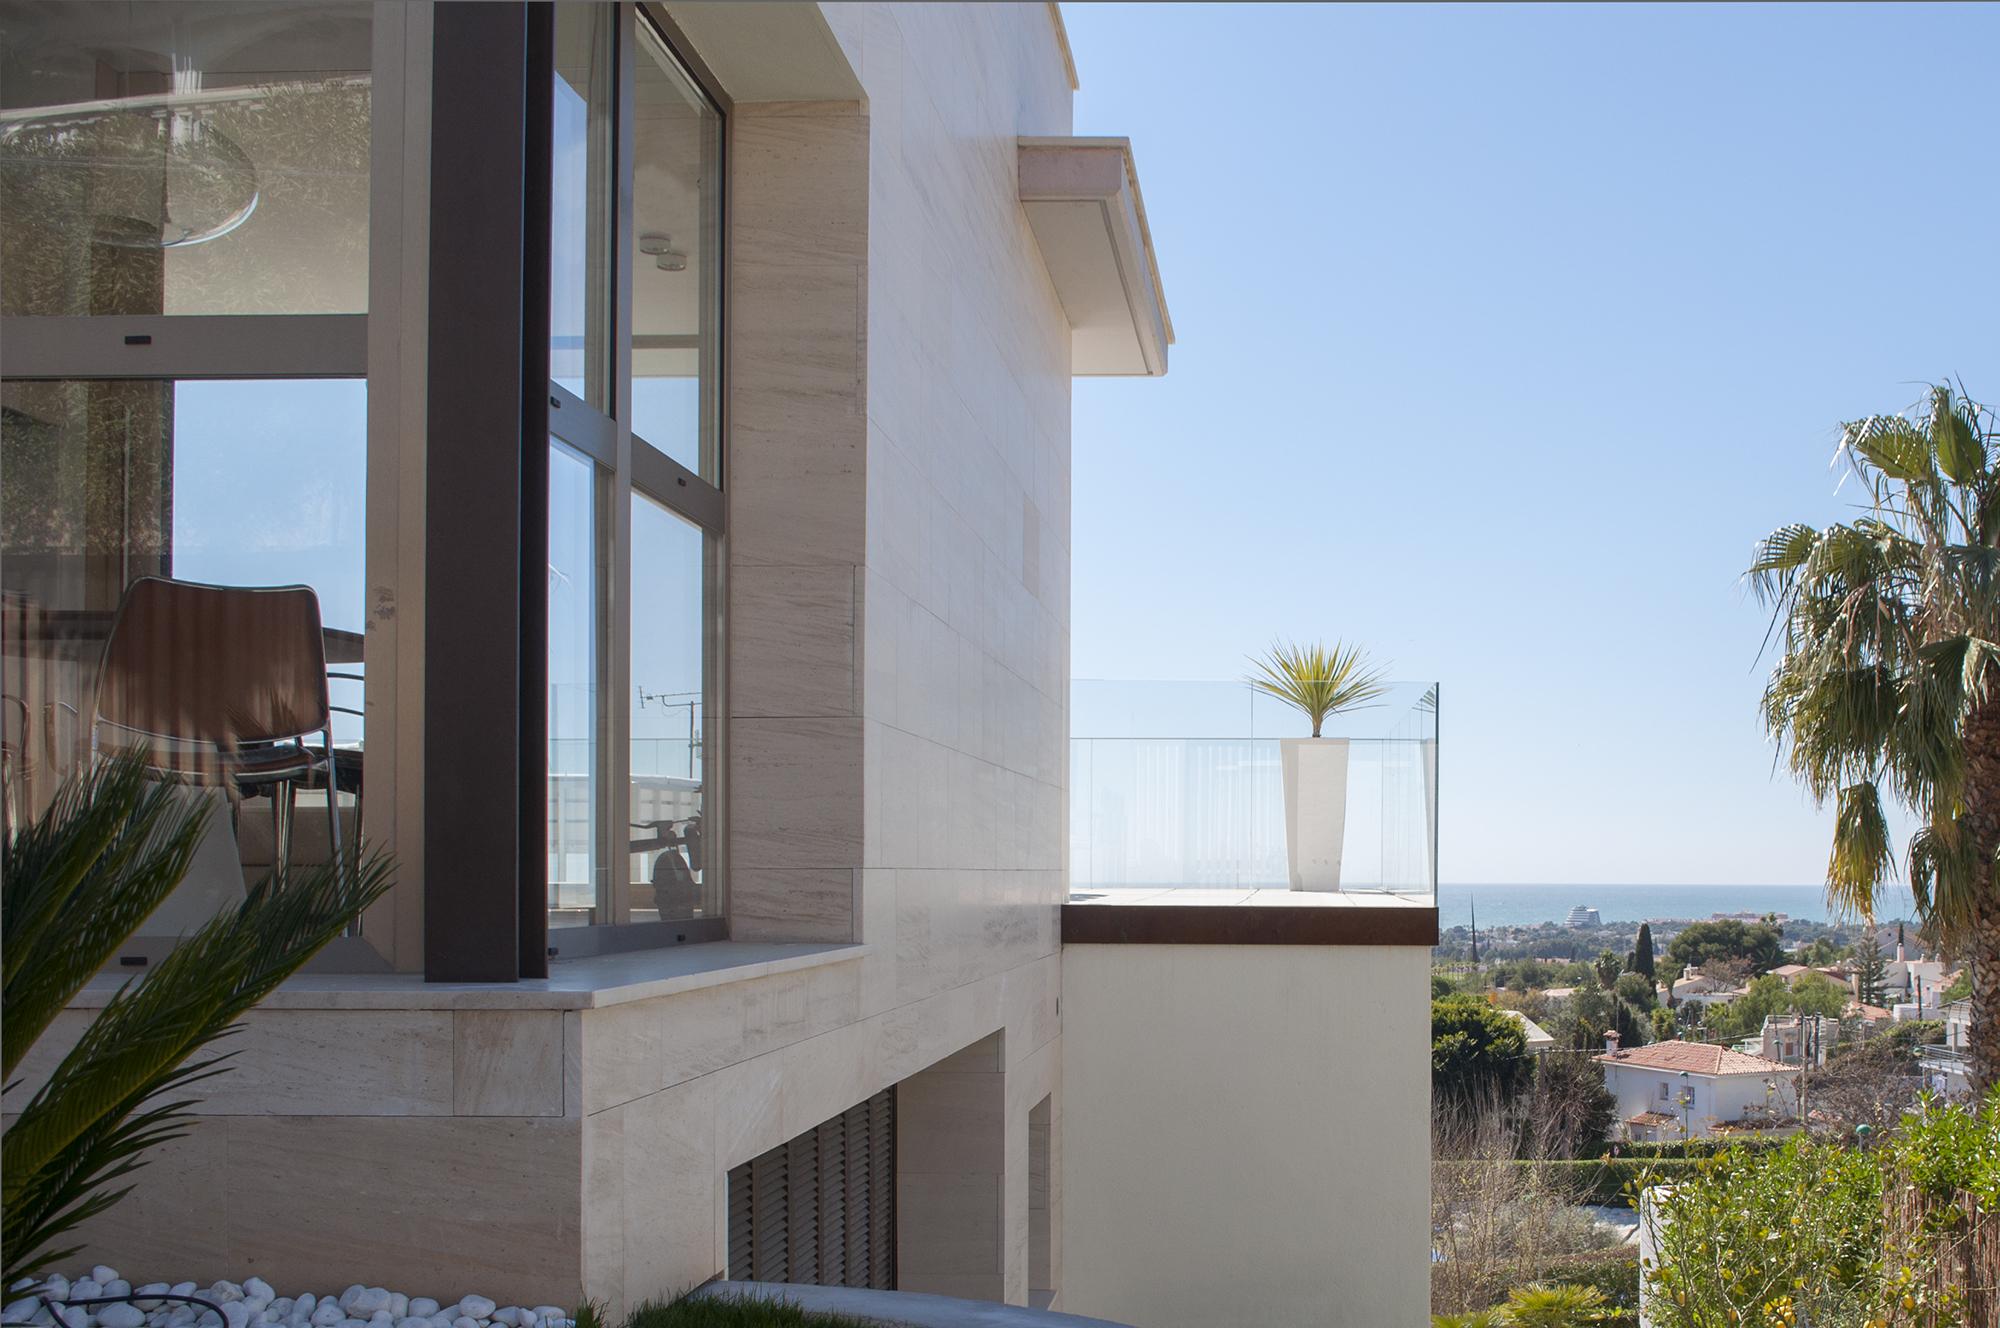 9-rardo-architects-casas-en-sitges-ventana-en-esquina-vista-al-mar-terraza